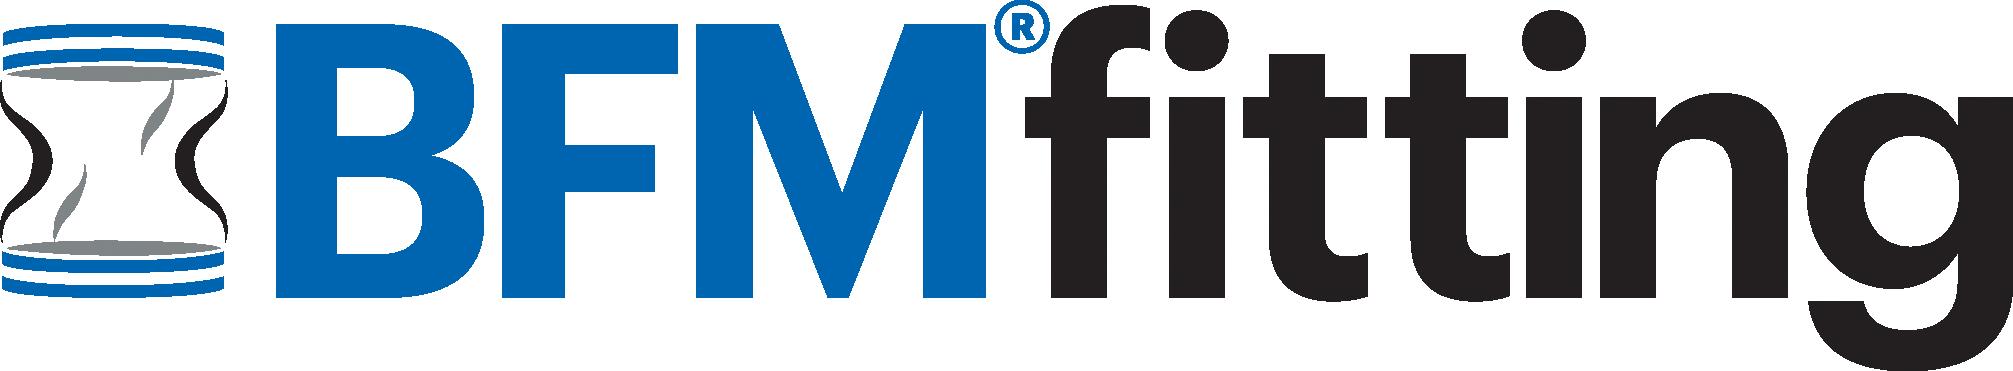 BFM Fitting RGB long R.png